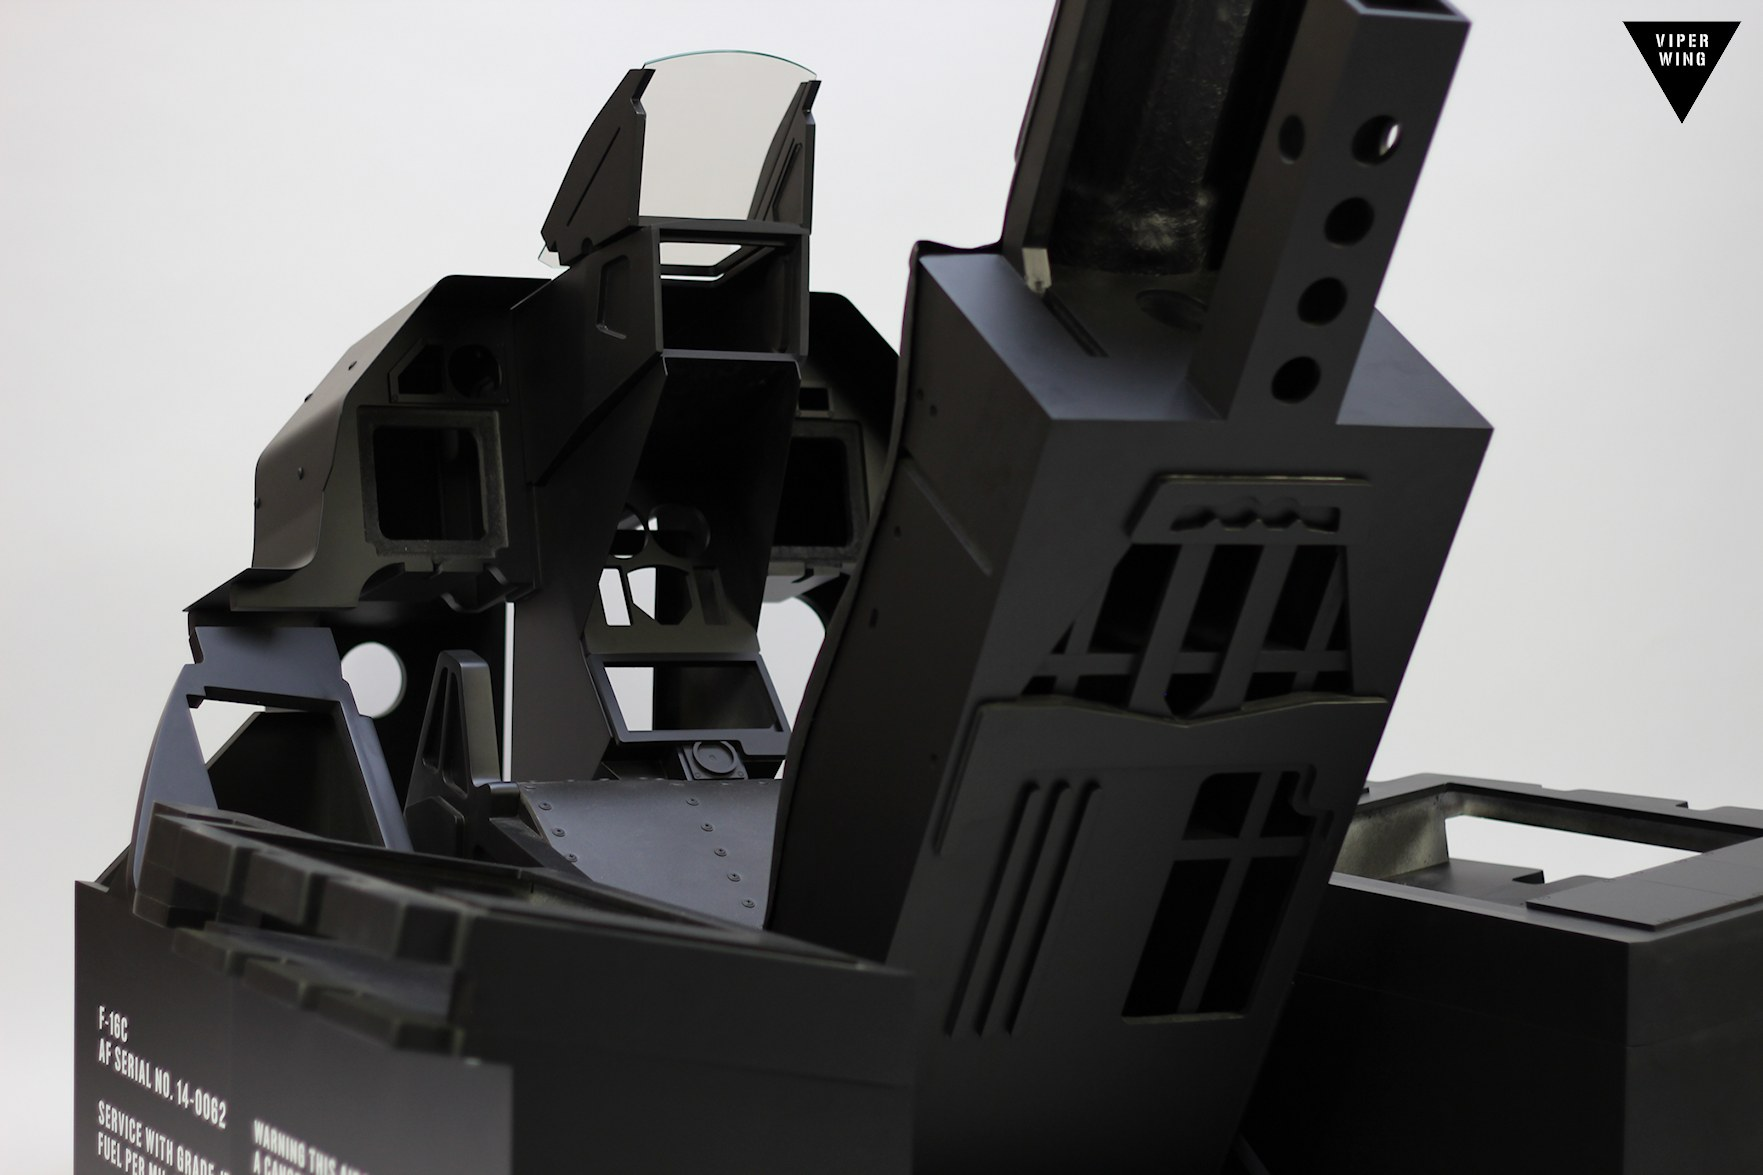 F 16 Simulator Fighter Jet Cockpit Turnkey Viper In 8 Weeks